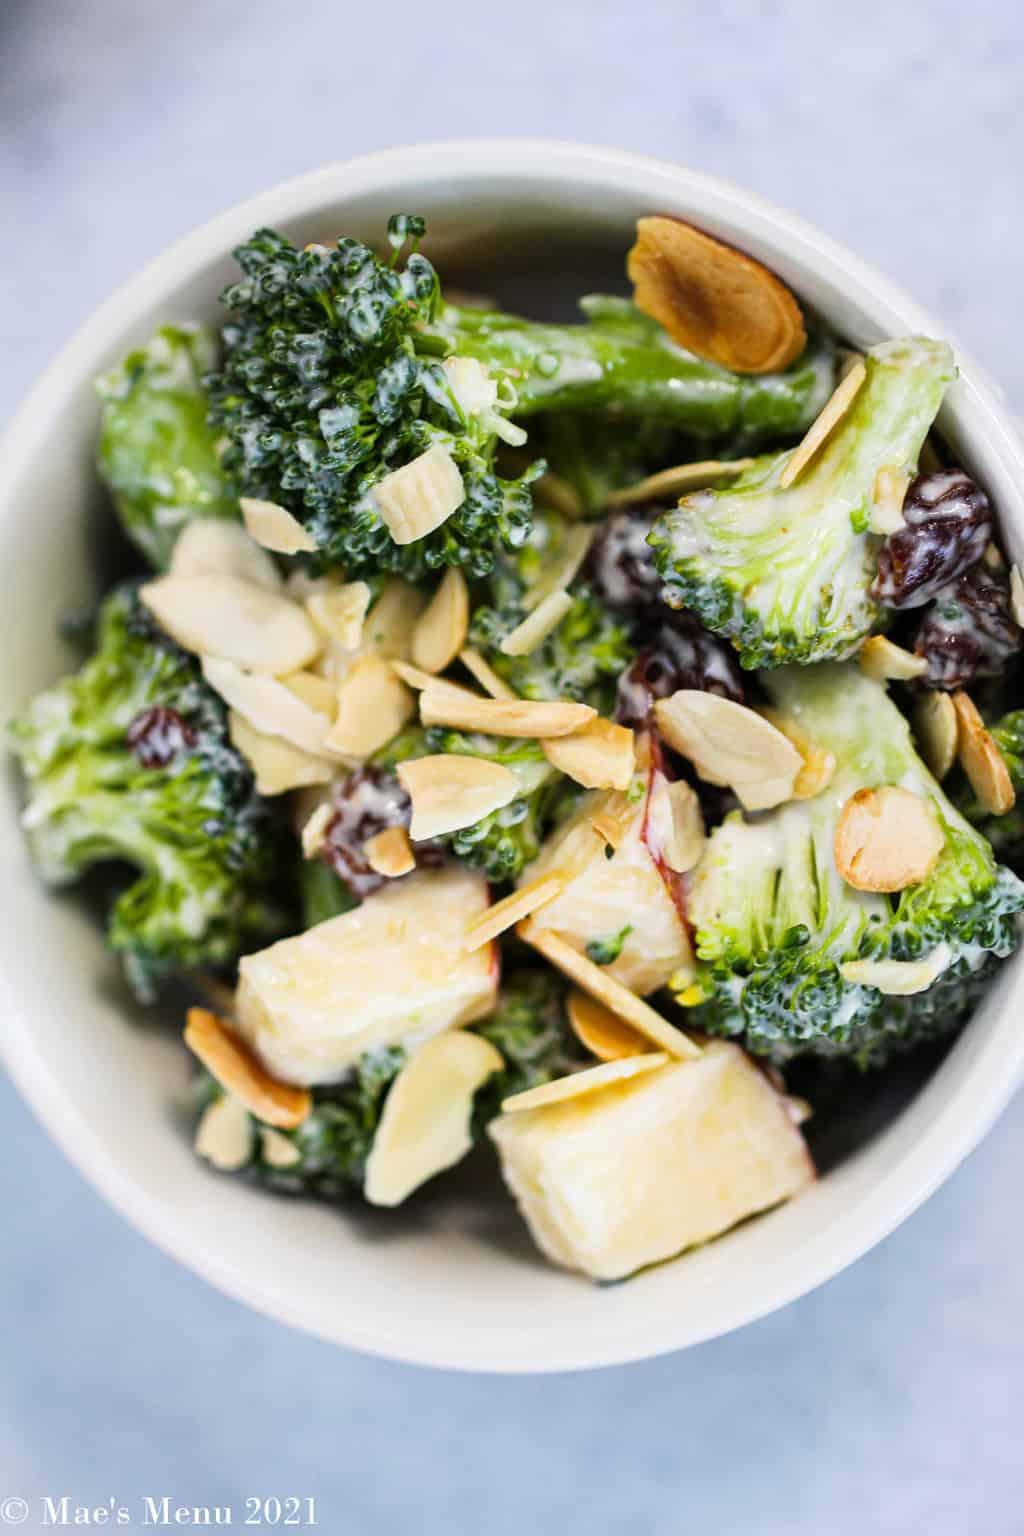 An up-close overhead shot of a bowl of broccoli raisin salad